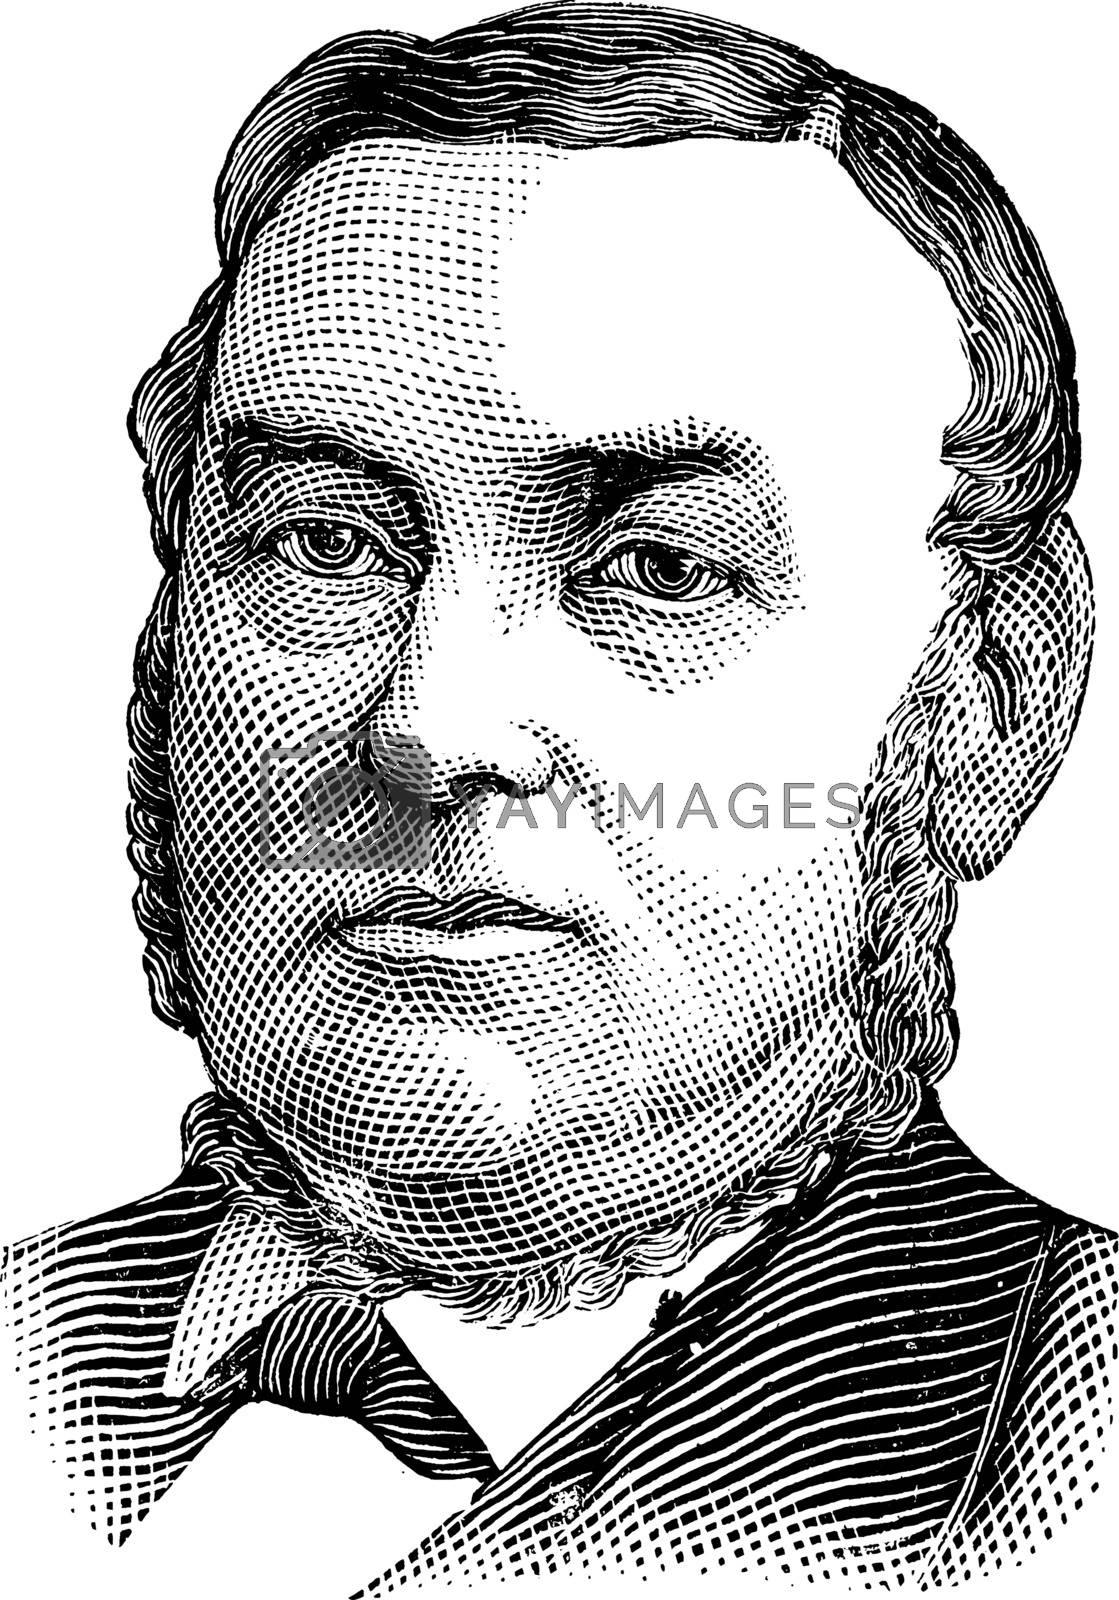 George W. Childs, vintage illustration by Morphart